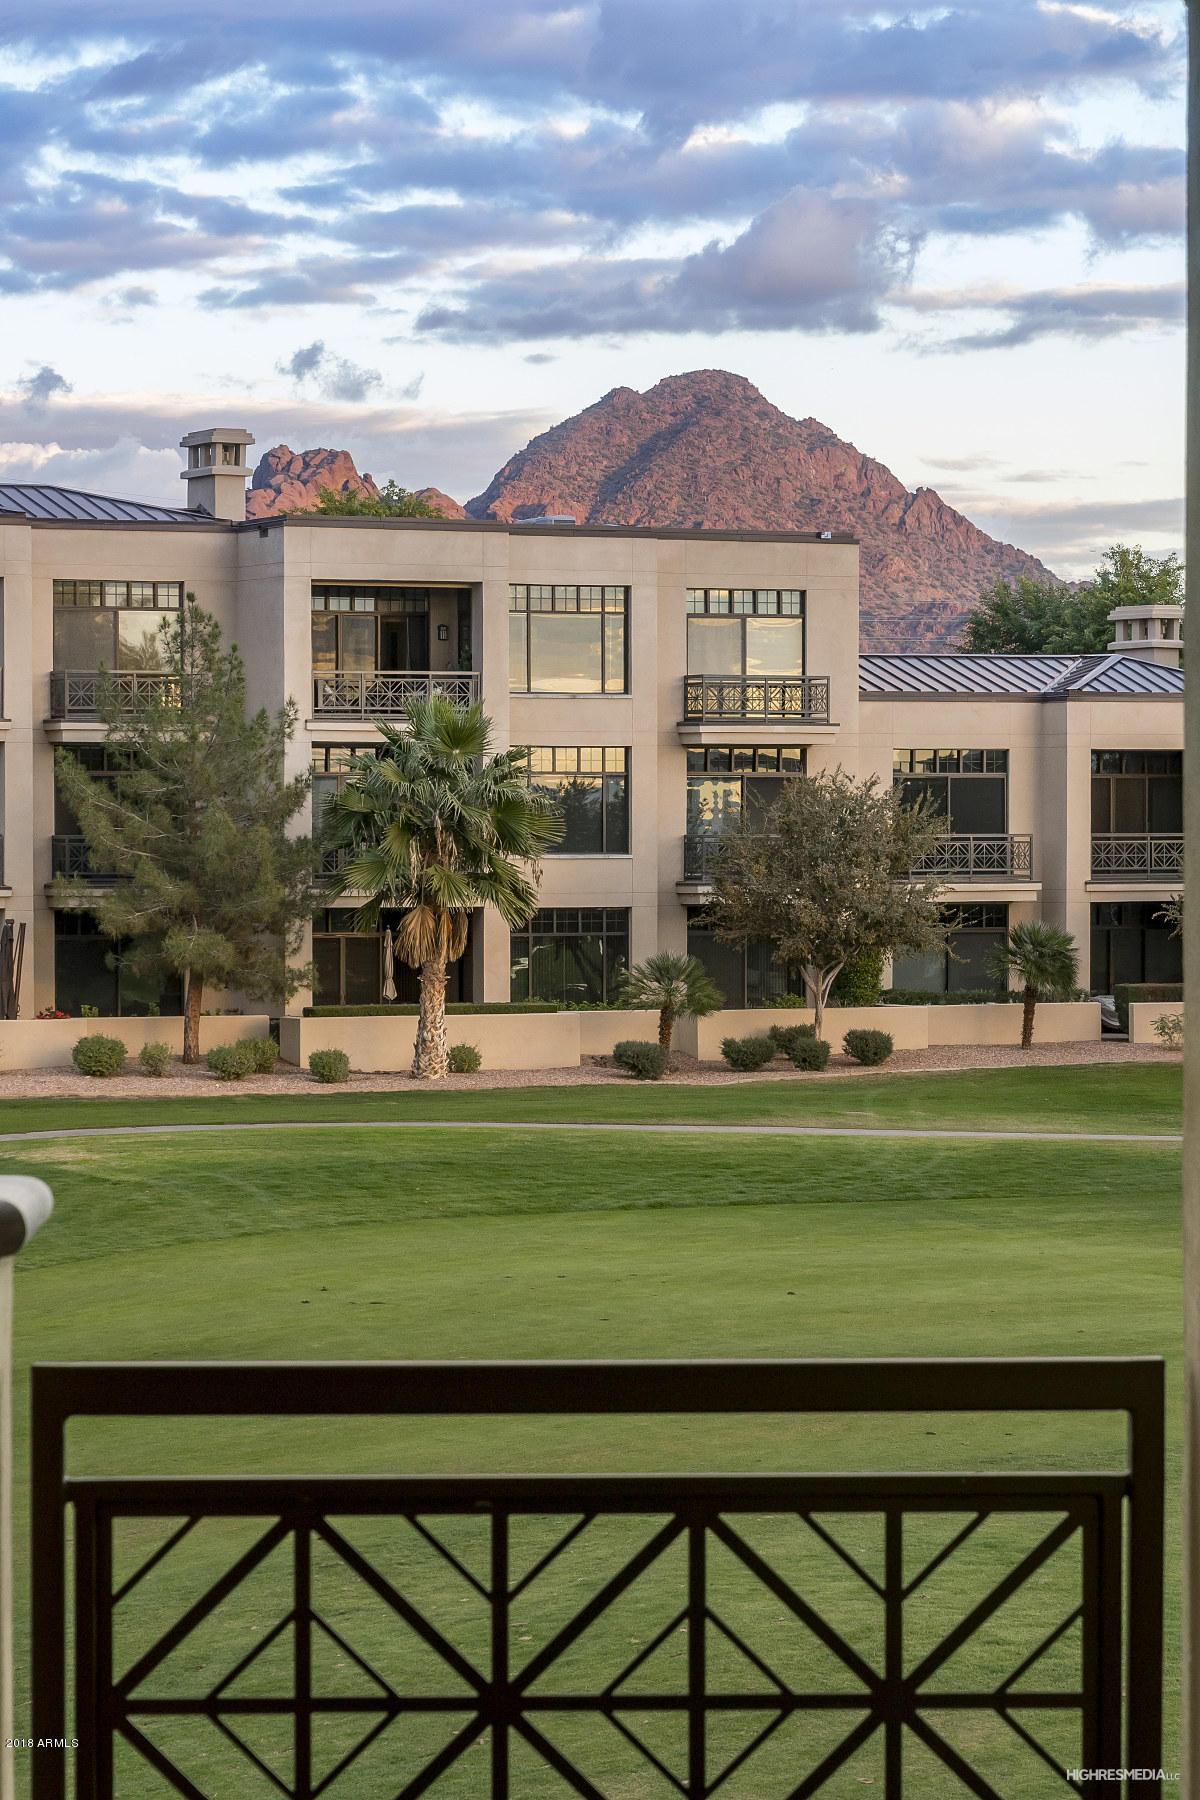 MLS 5857333 2 BILTMORE Estate Unit 213 Building 5, Phoenix, AZ 85016 Phoenix AZ Condo or Townhome